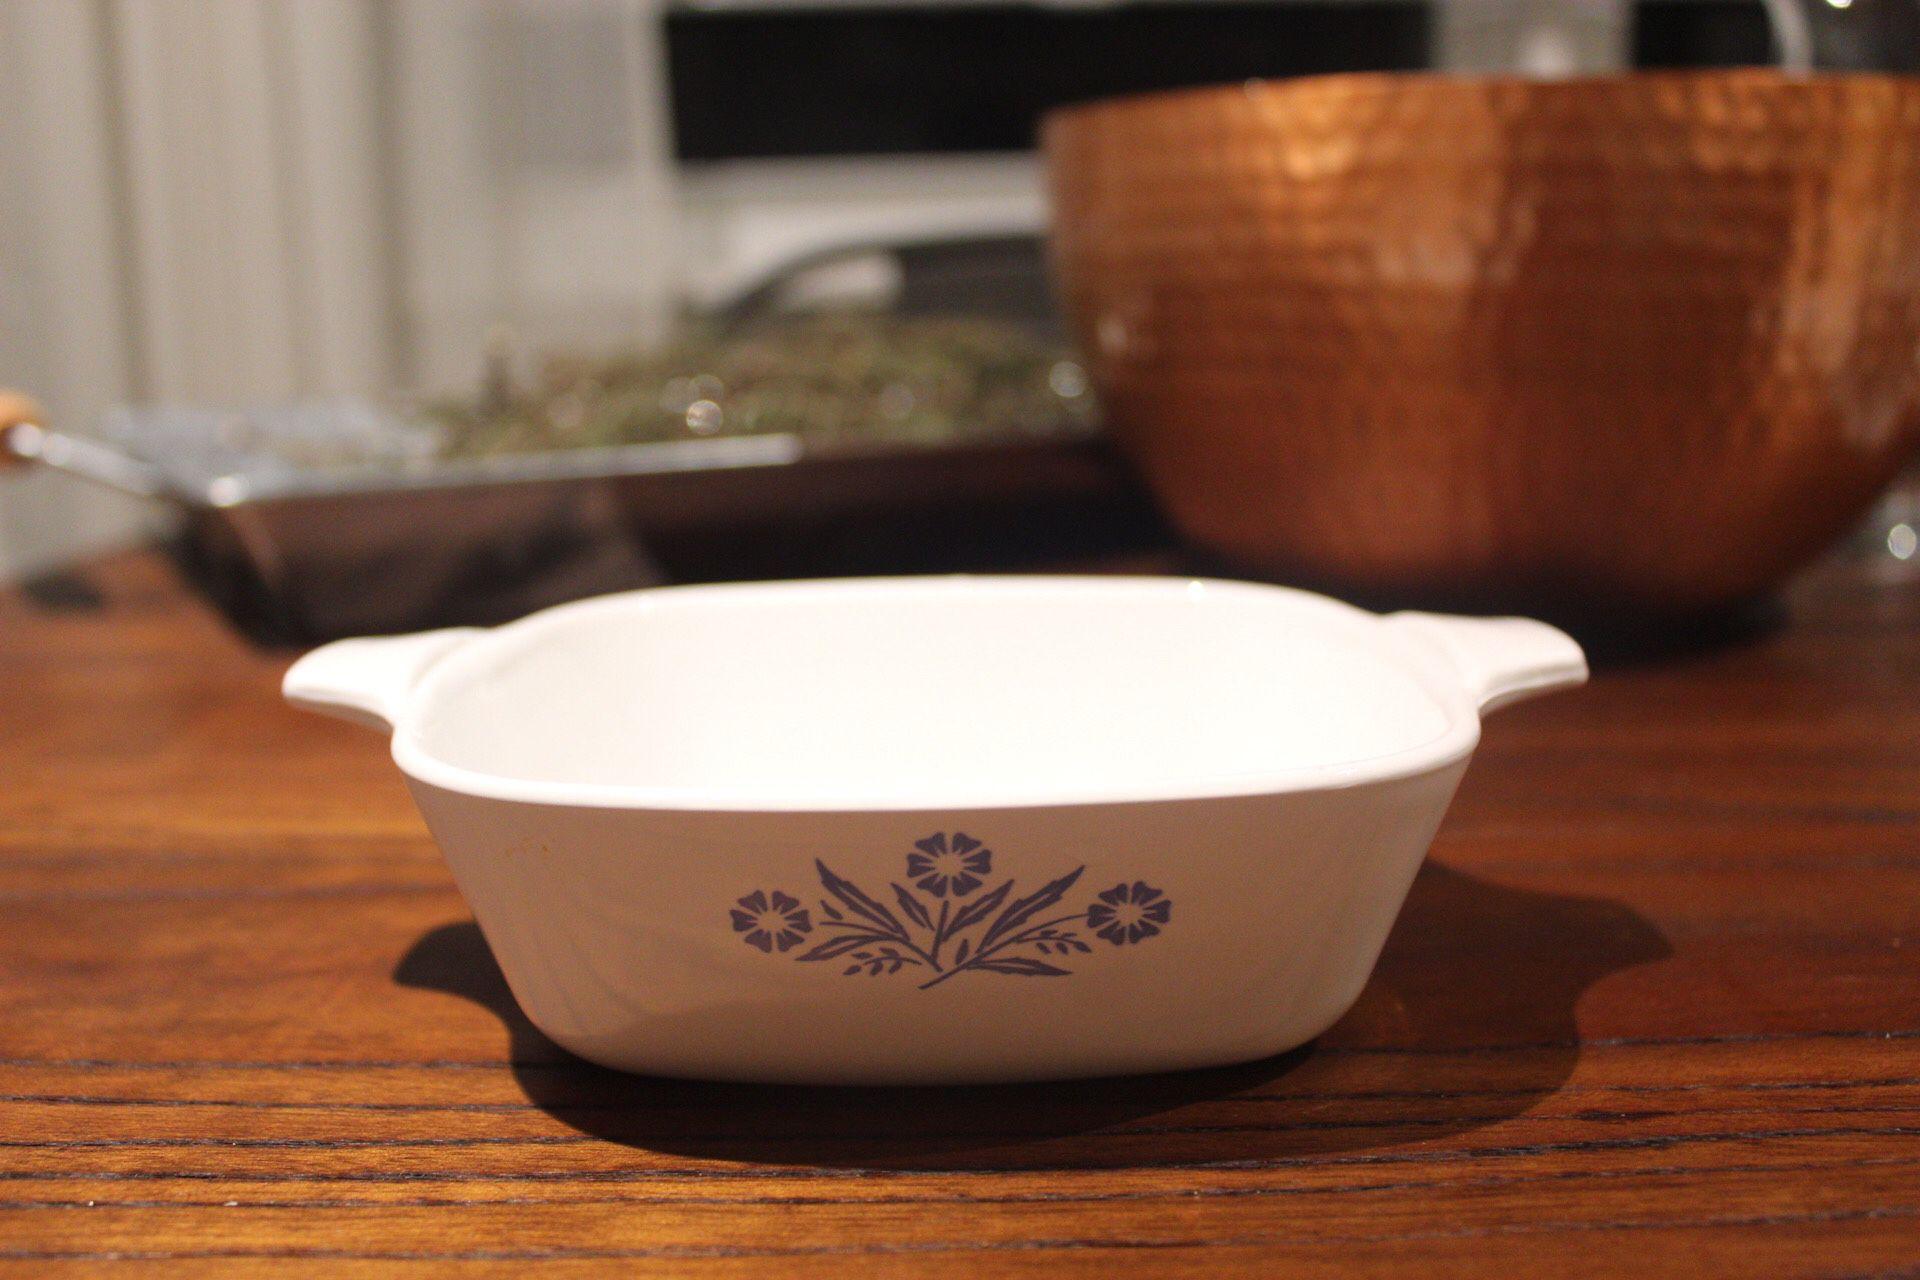 Set Of 2 Corning Ware Blue Cornflower P-41-B Petite Pans ~ 2 3/4 Cup No Lids